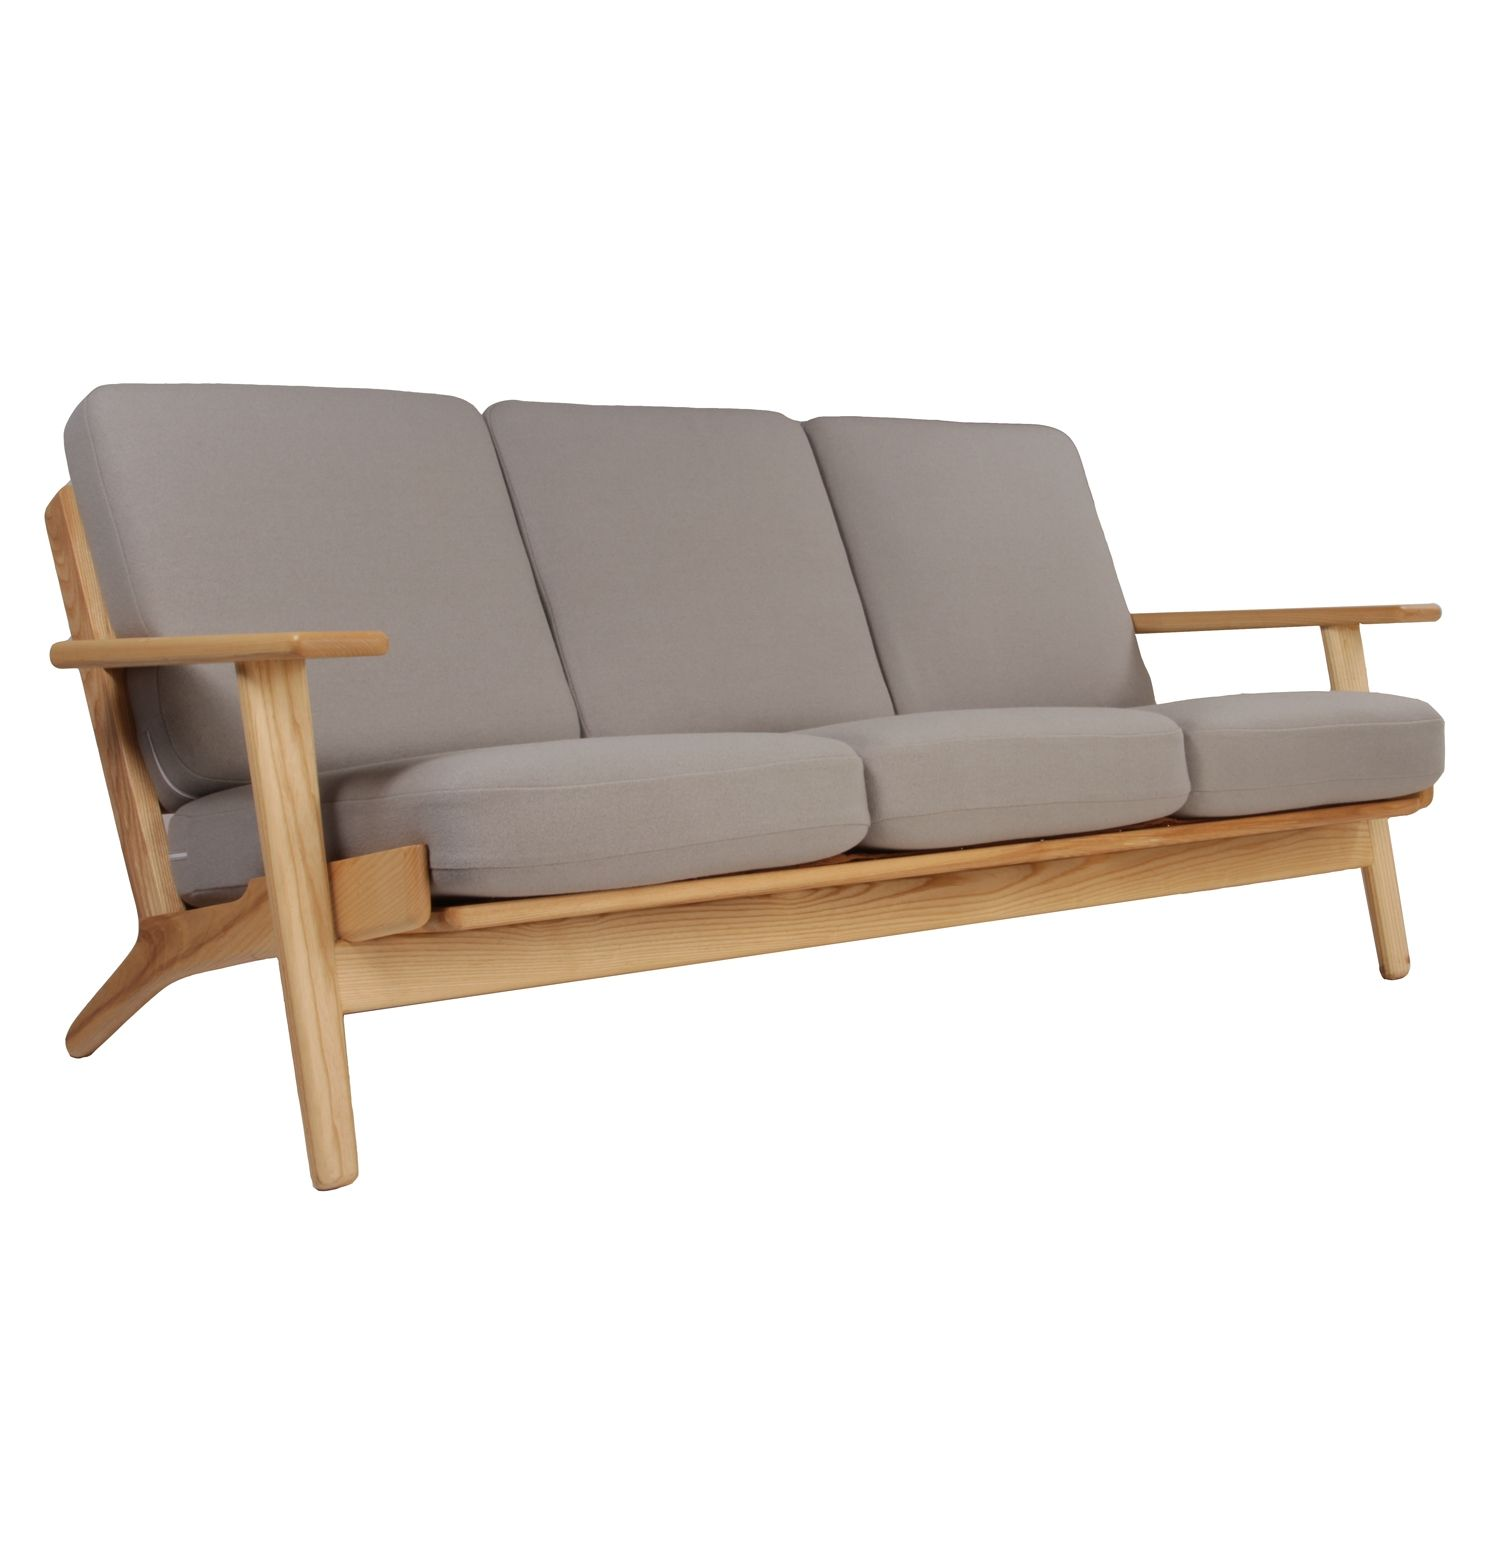 7 seater wooden sofa set designs top beds 2017 uk the matt blatt replica hans wegner plank 3